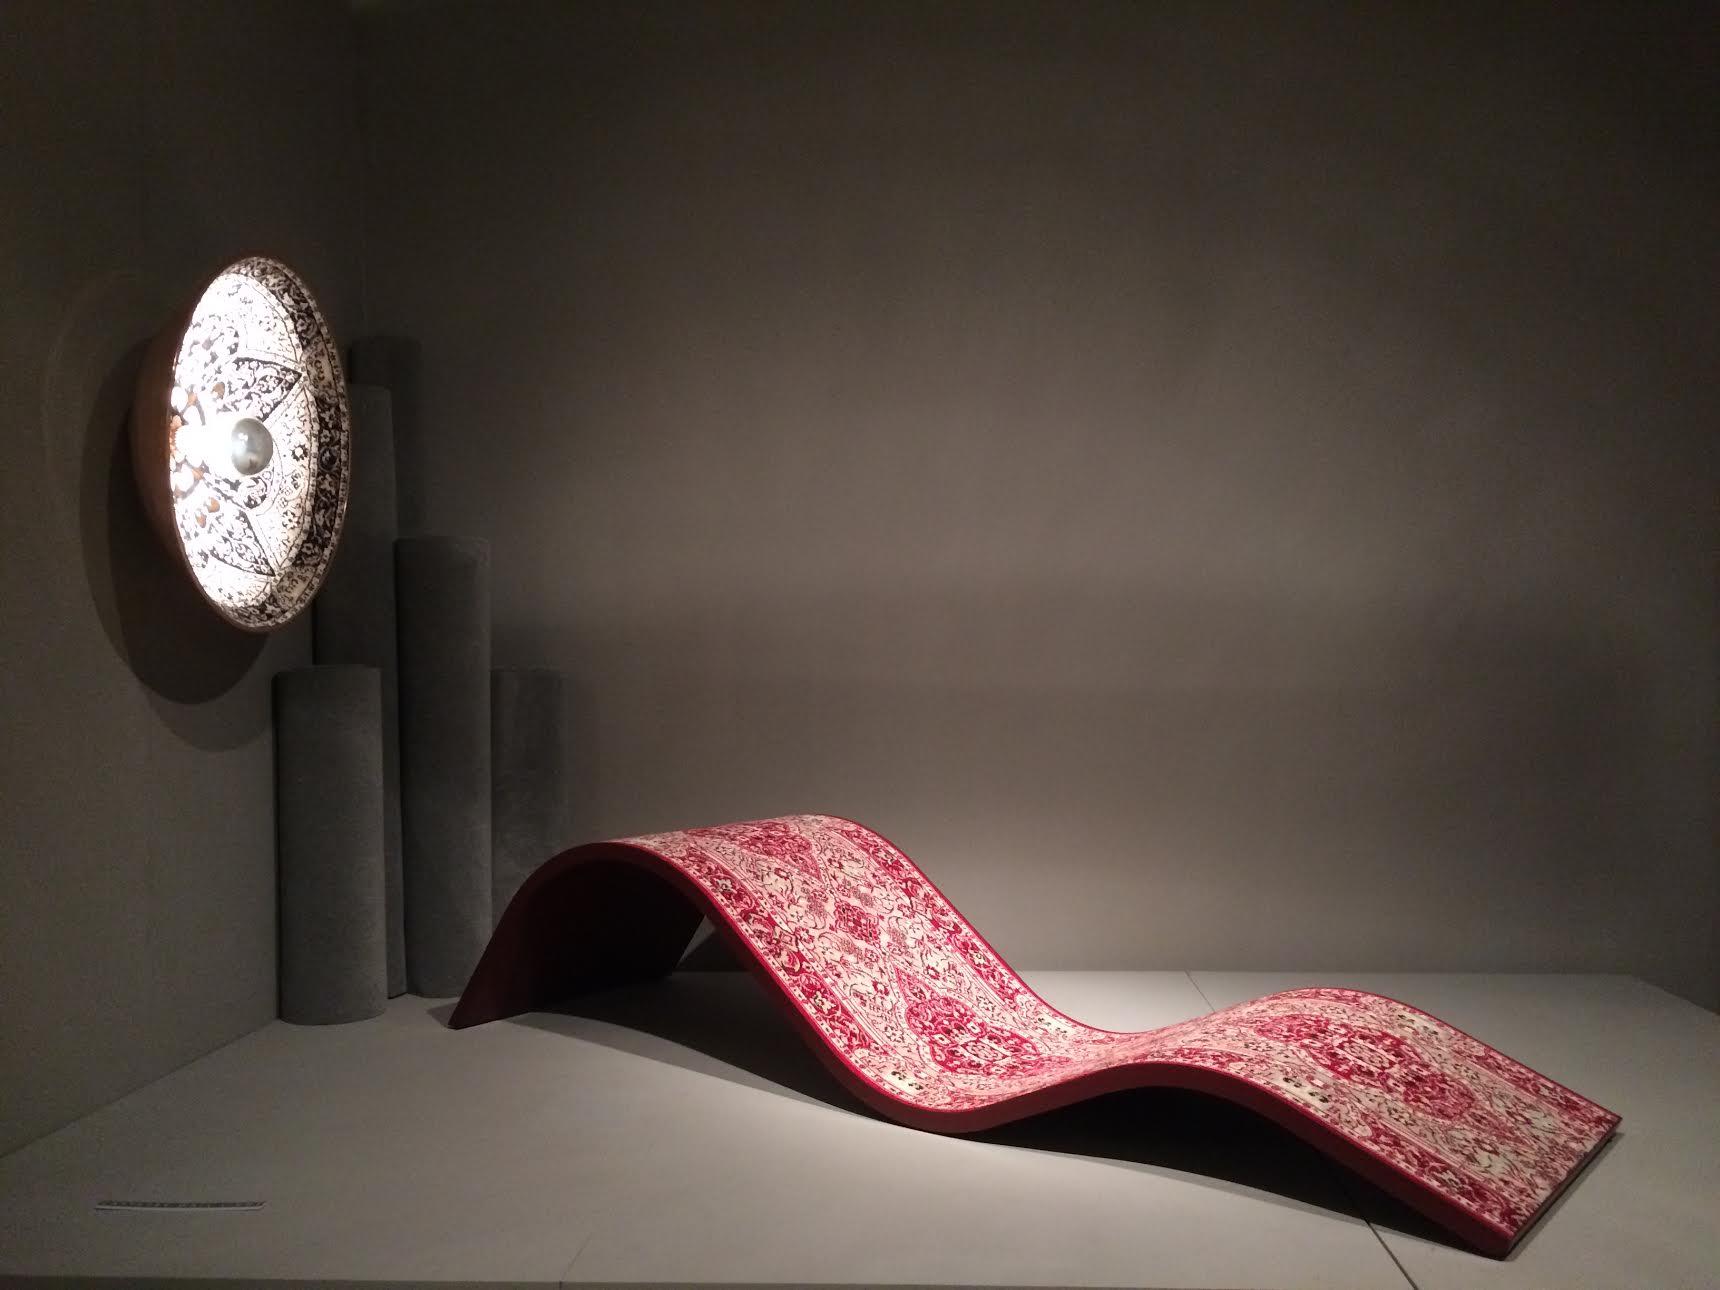 Lee Broom / Carpetry chaise longue